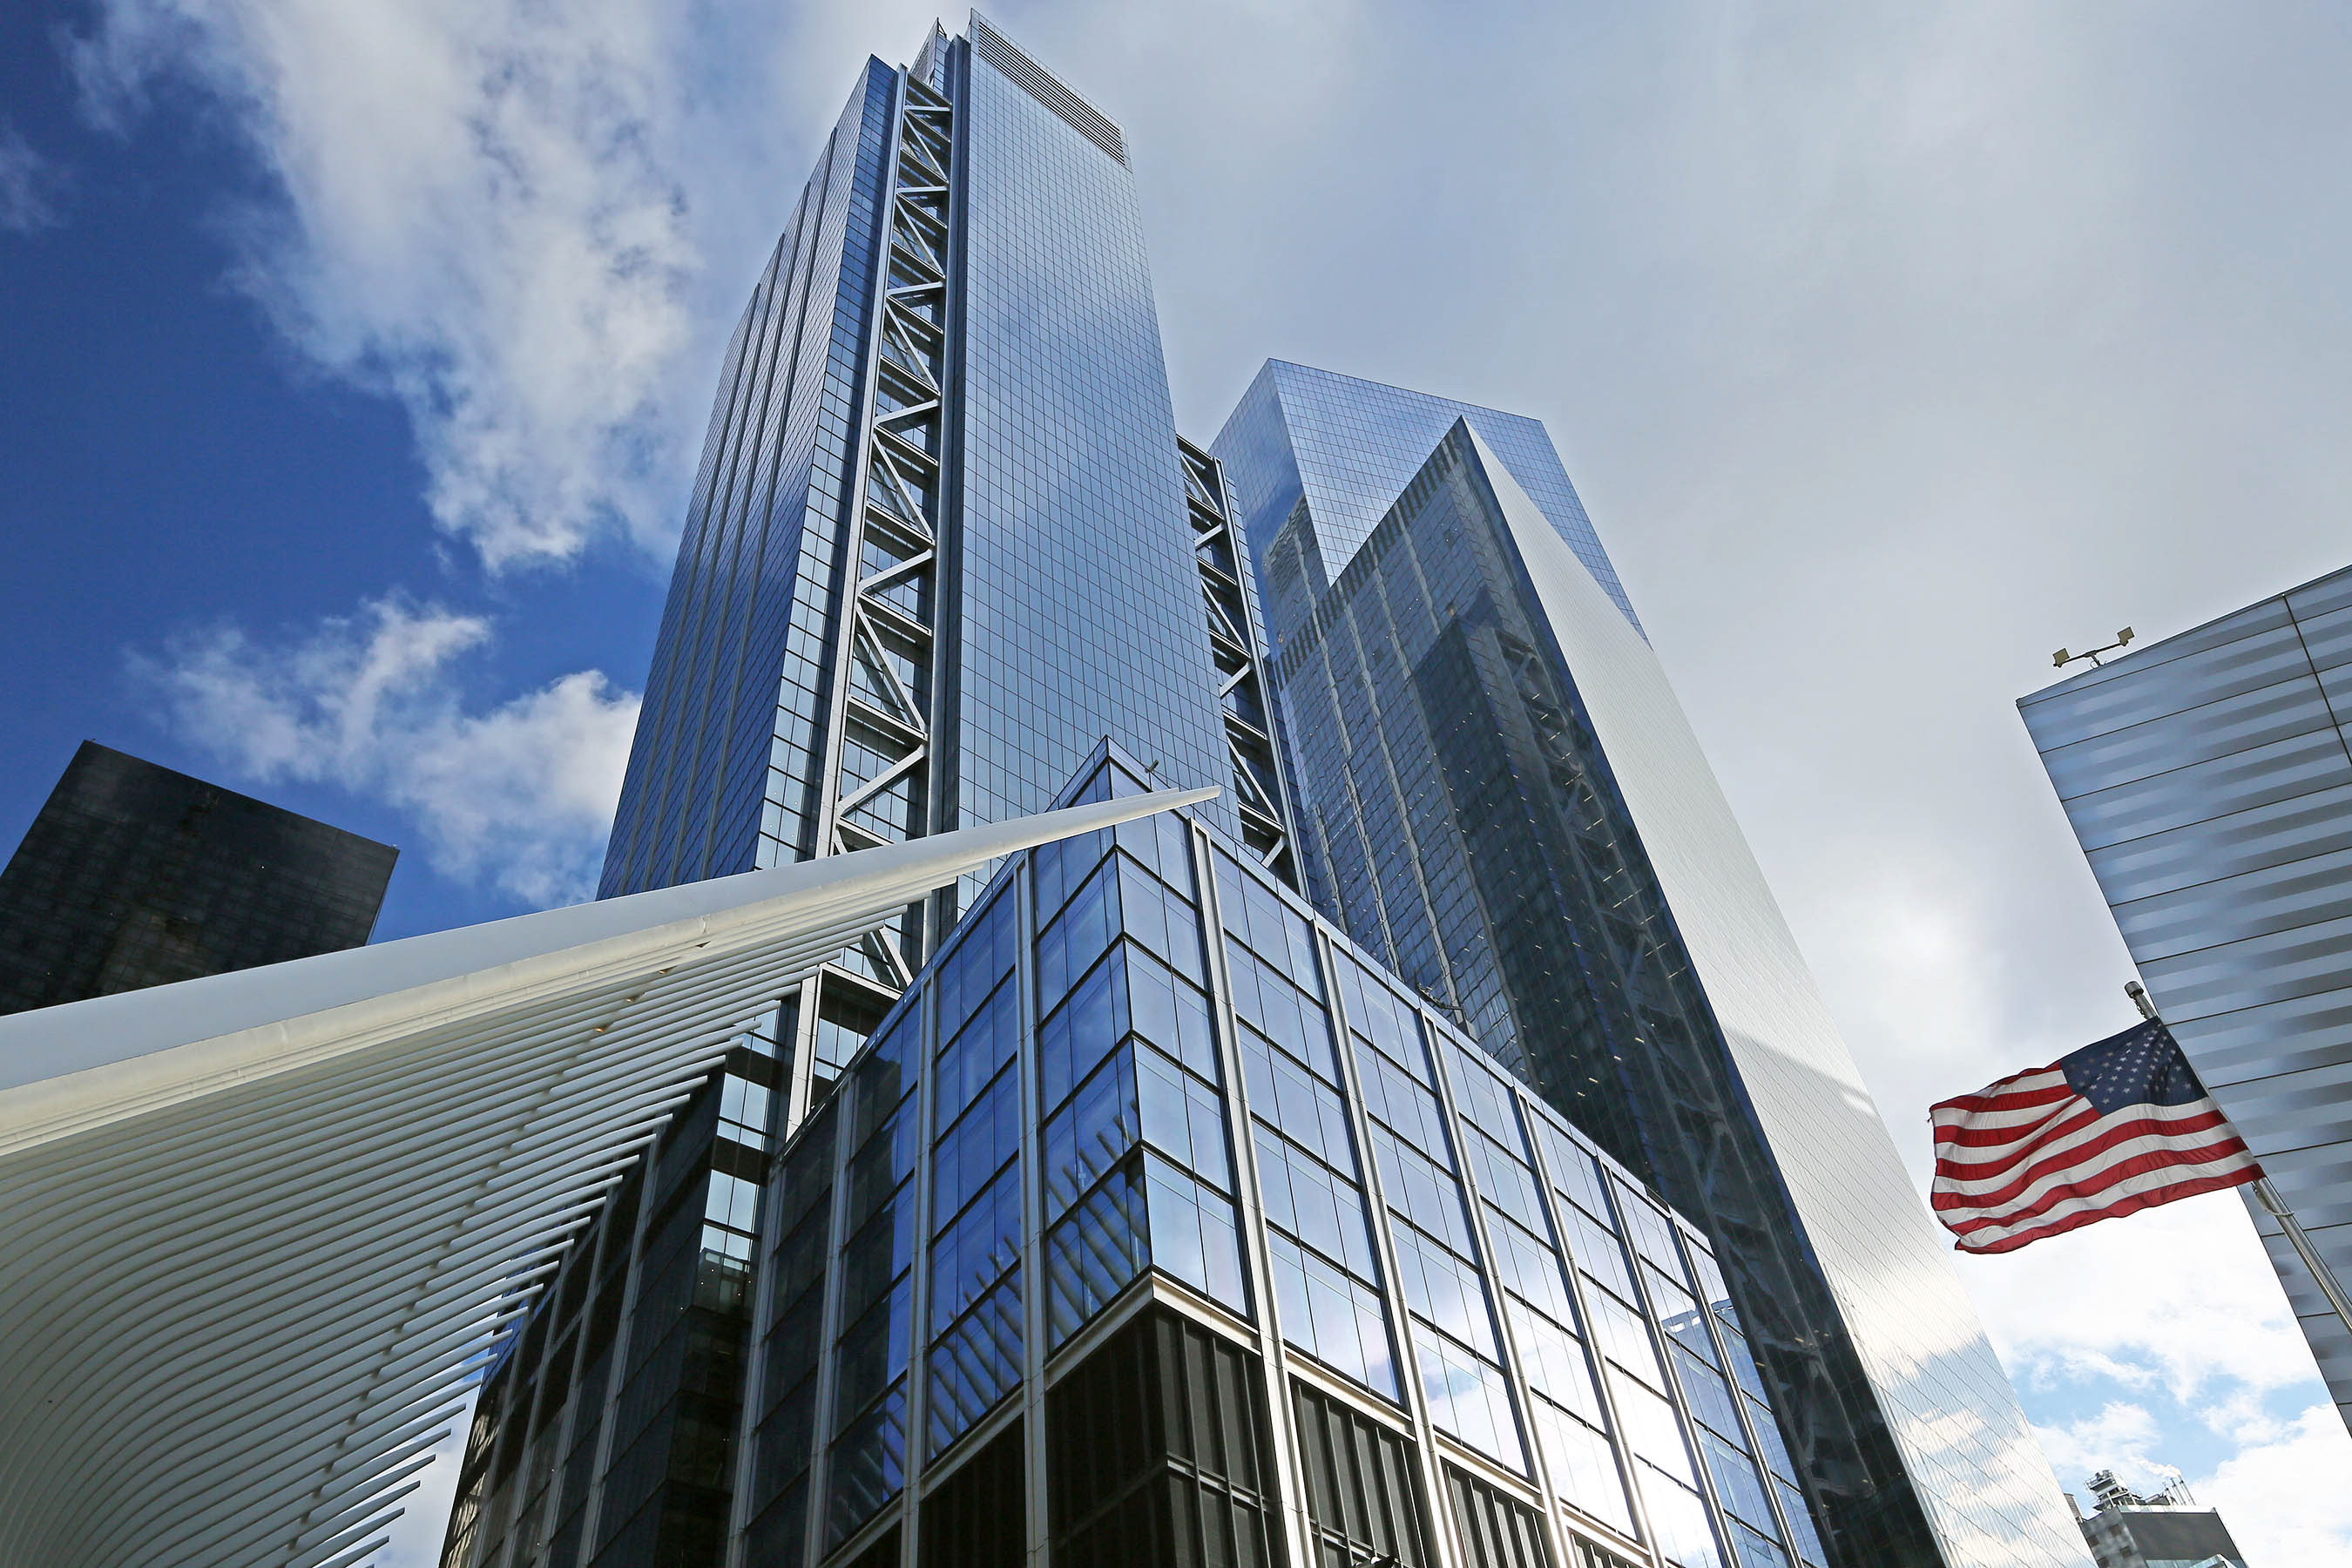 wpp-campus-new-york-manhattan-3-world-trade-center-tower-nyc